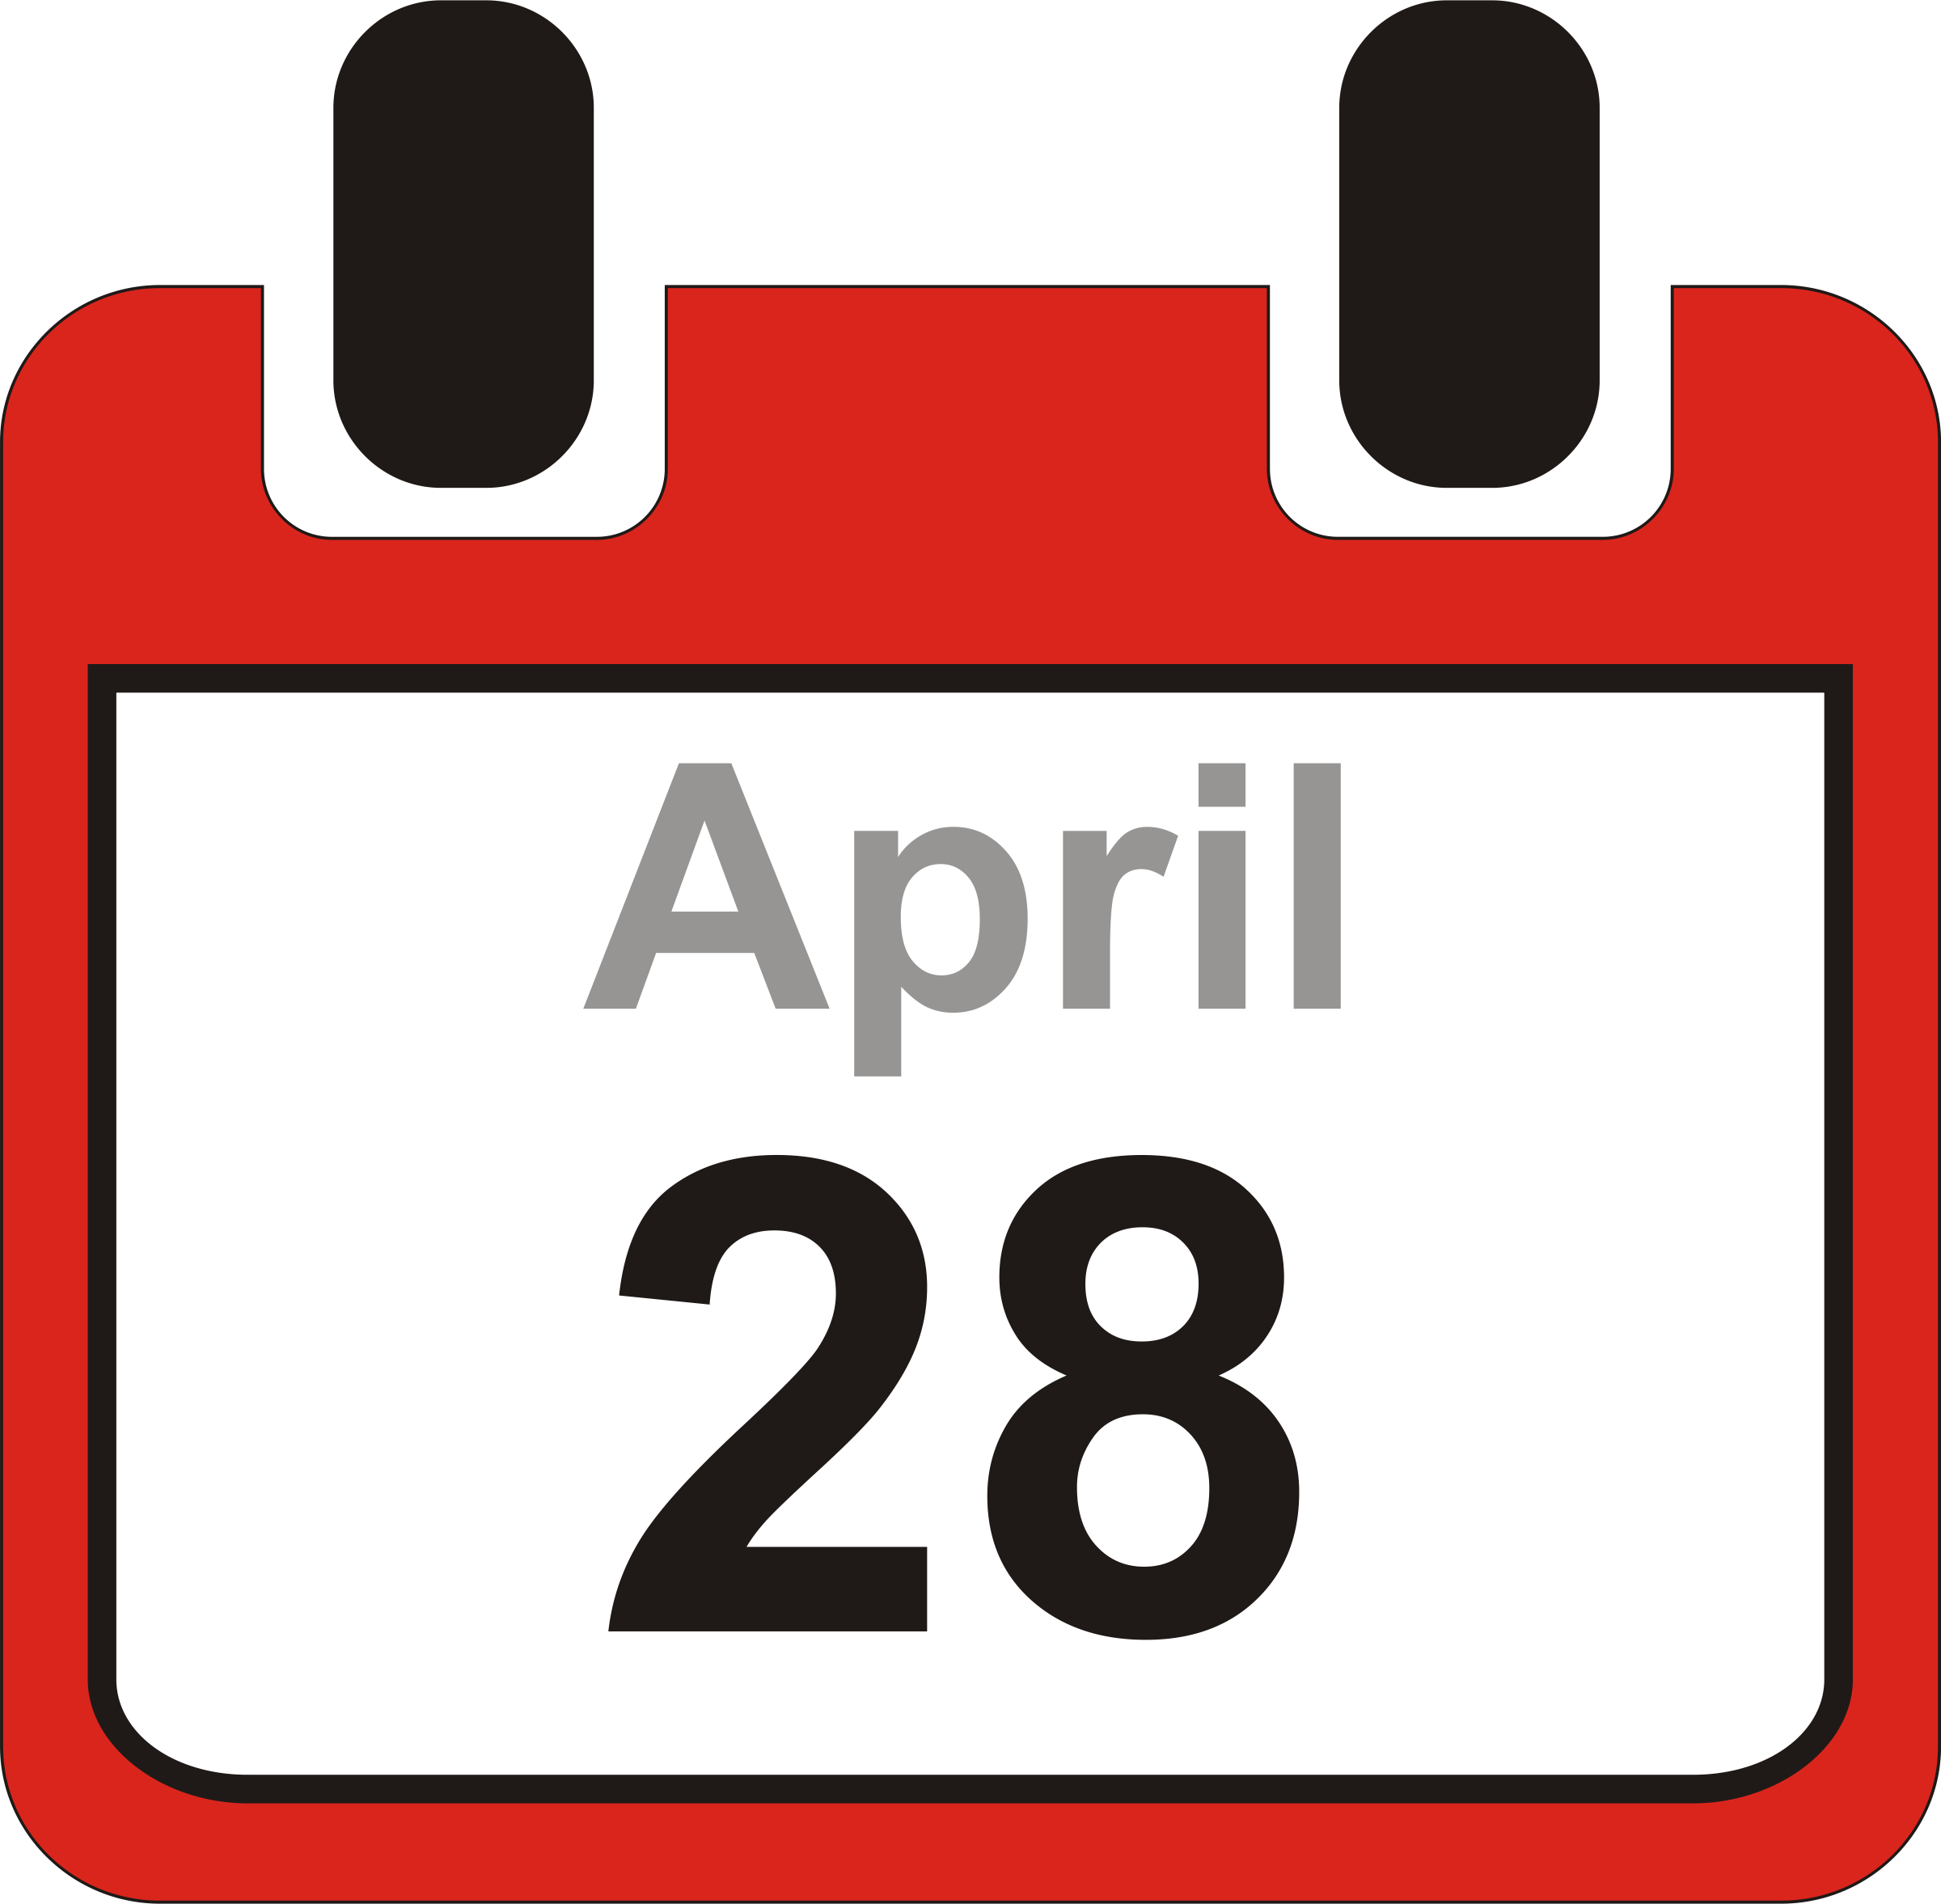 April calendar. Clipart free download best